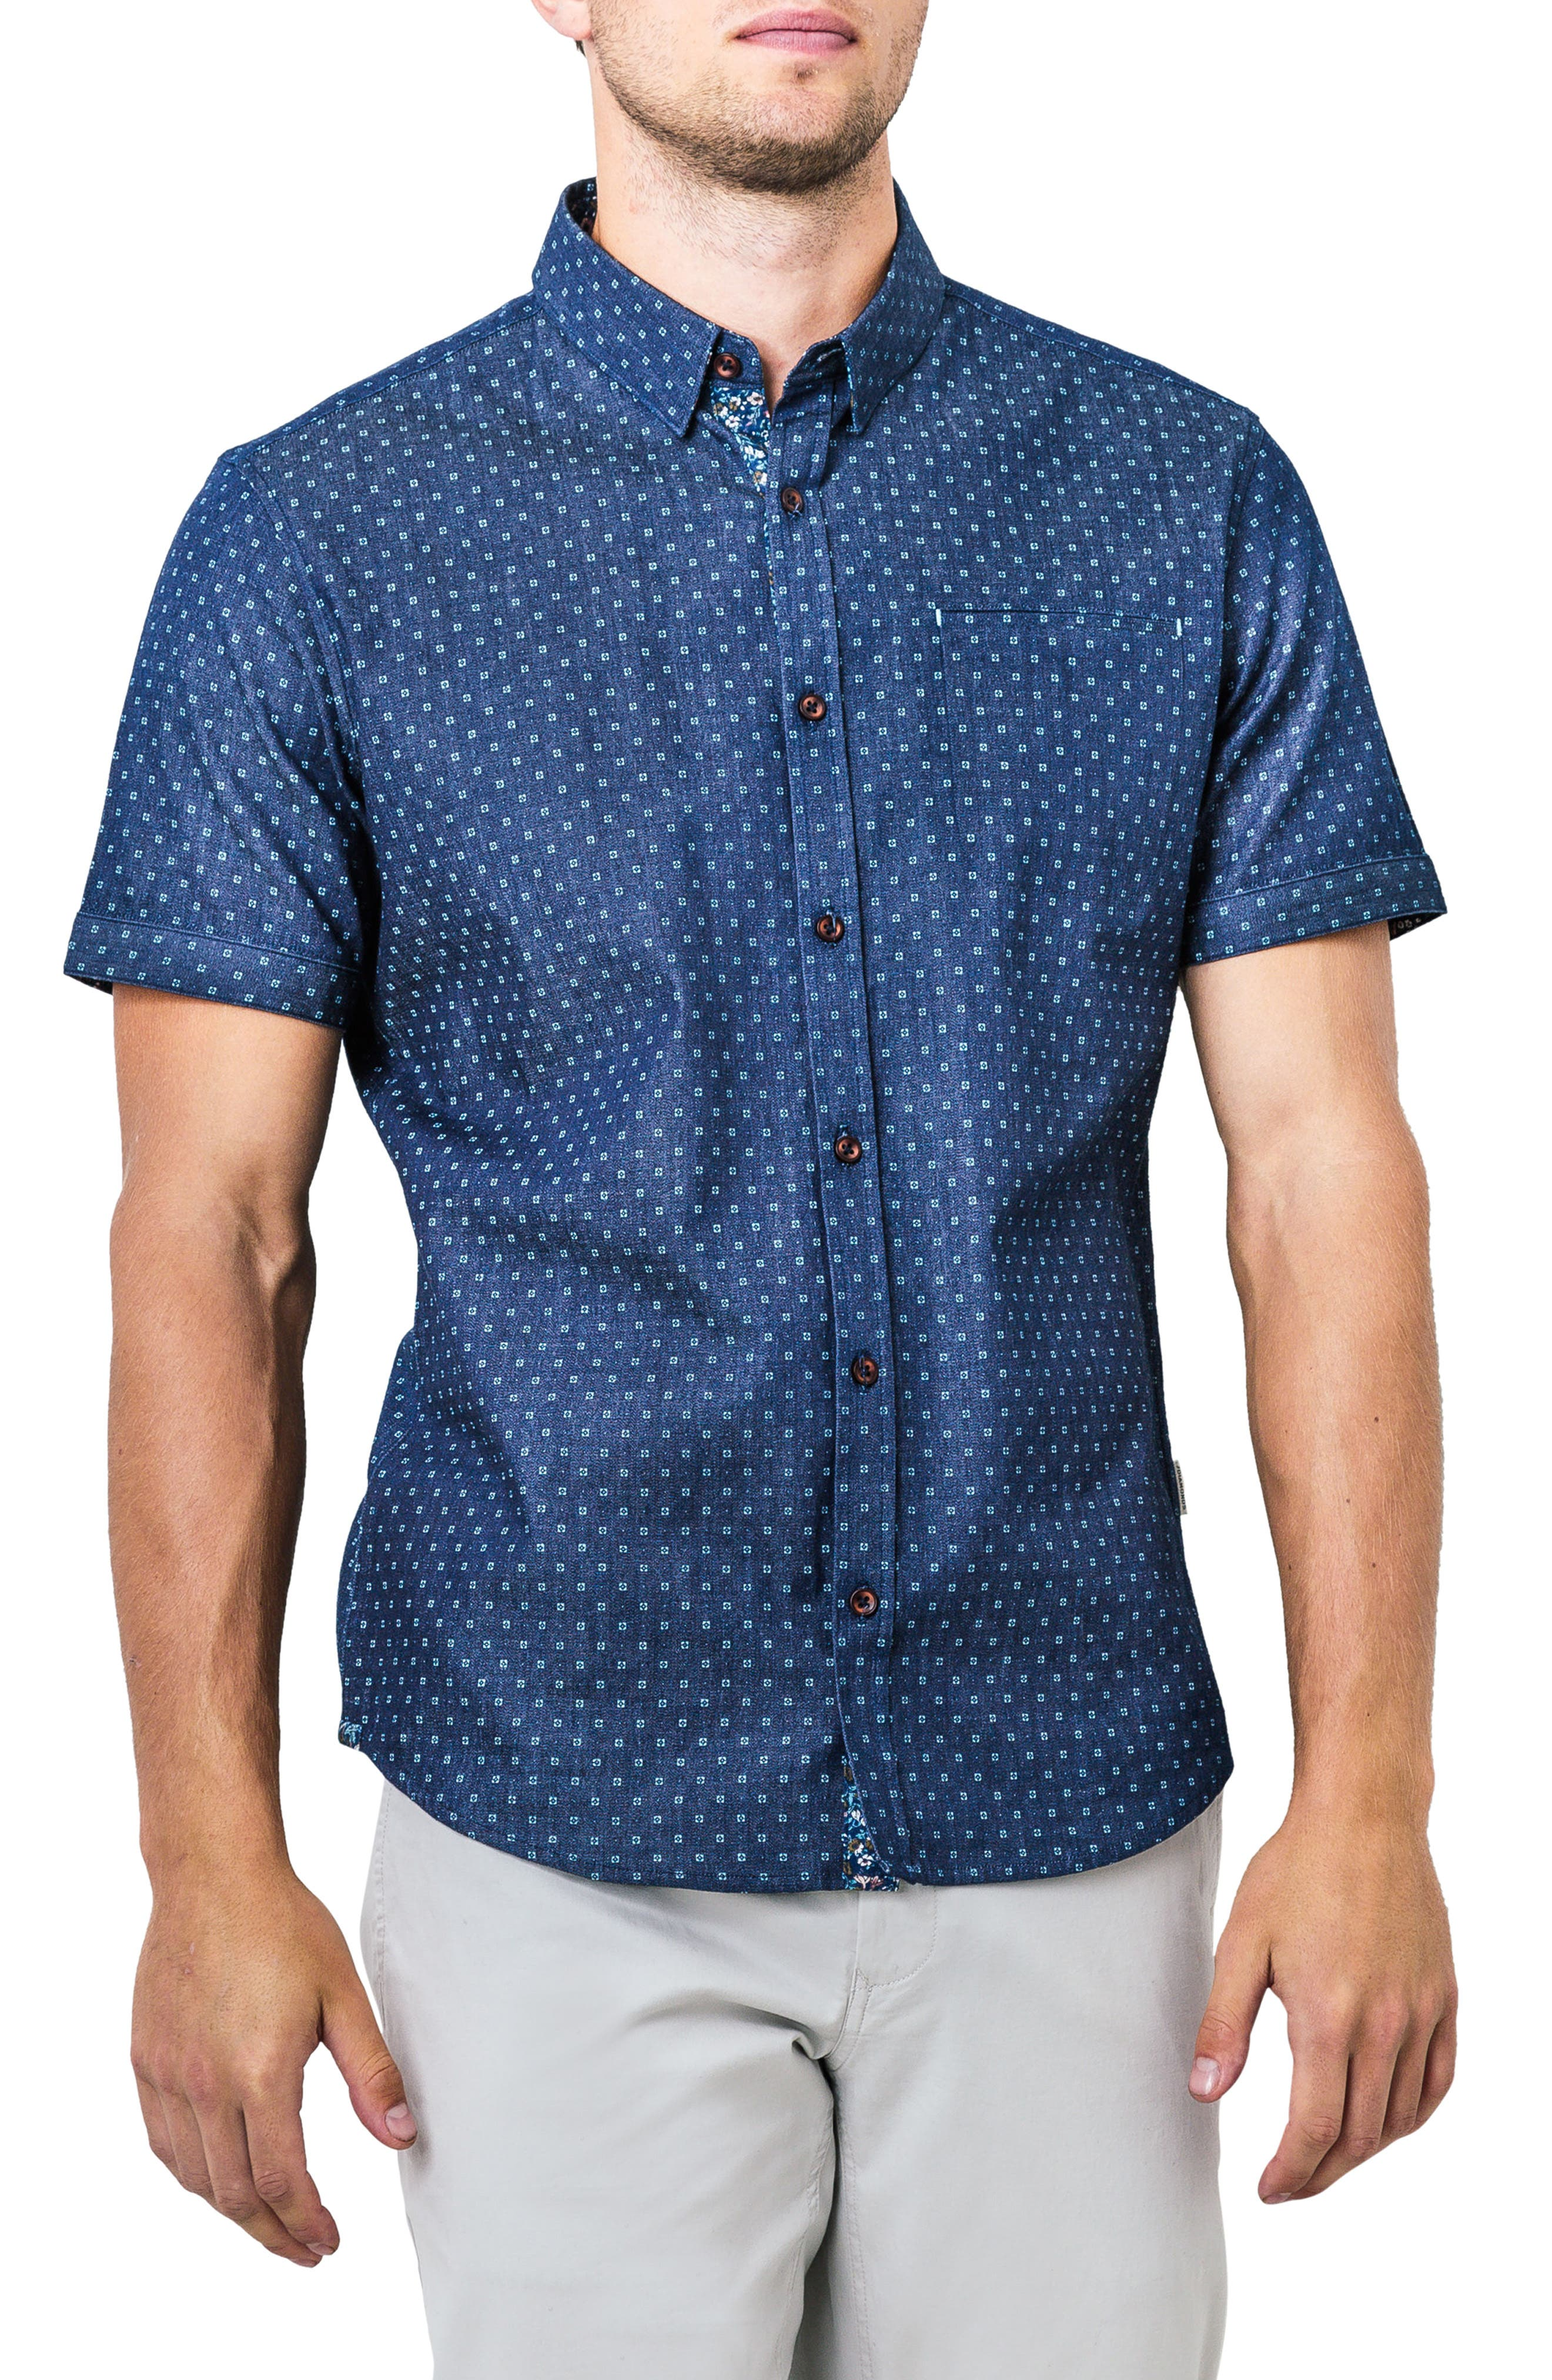 Innervision Woven Shirt,                             Main thumbnail 1, color,                             410